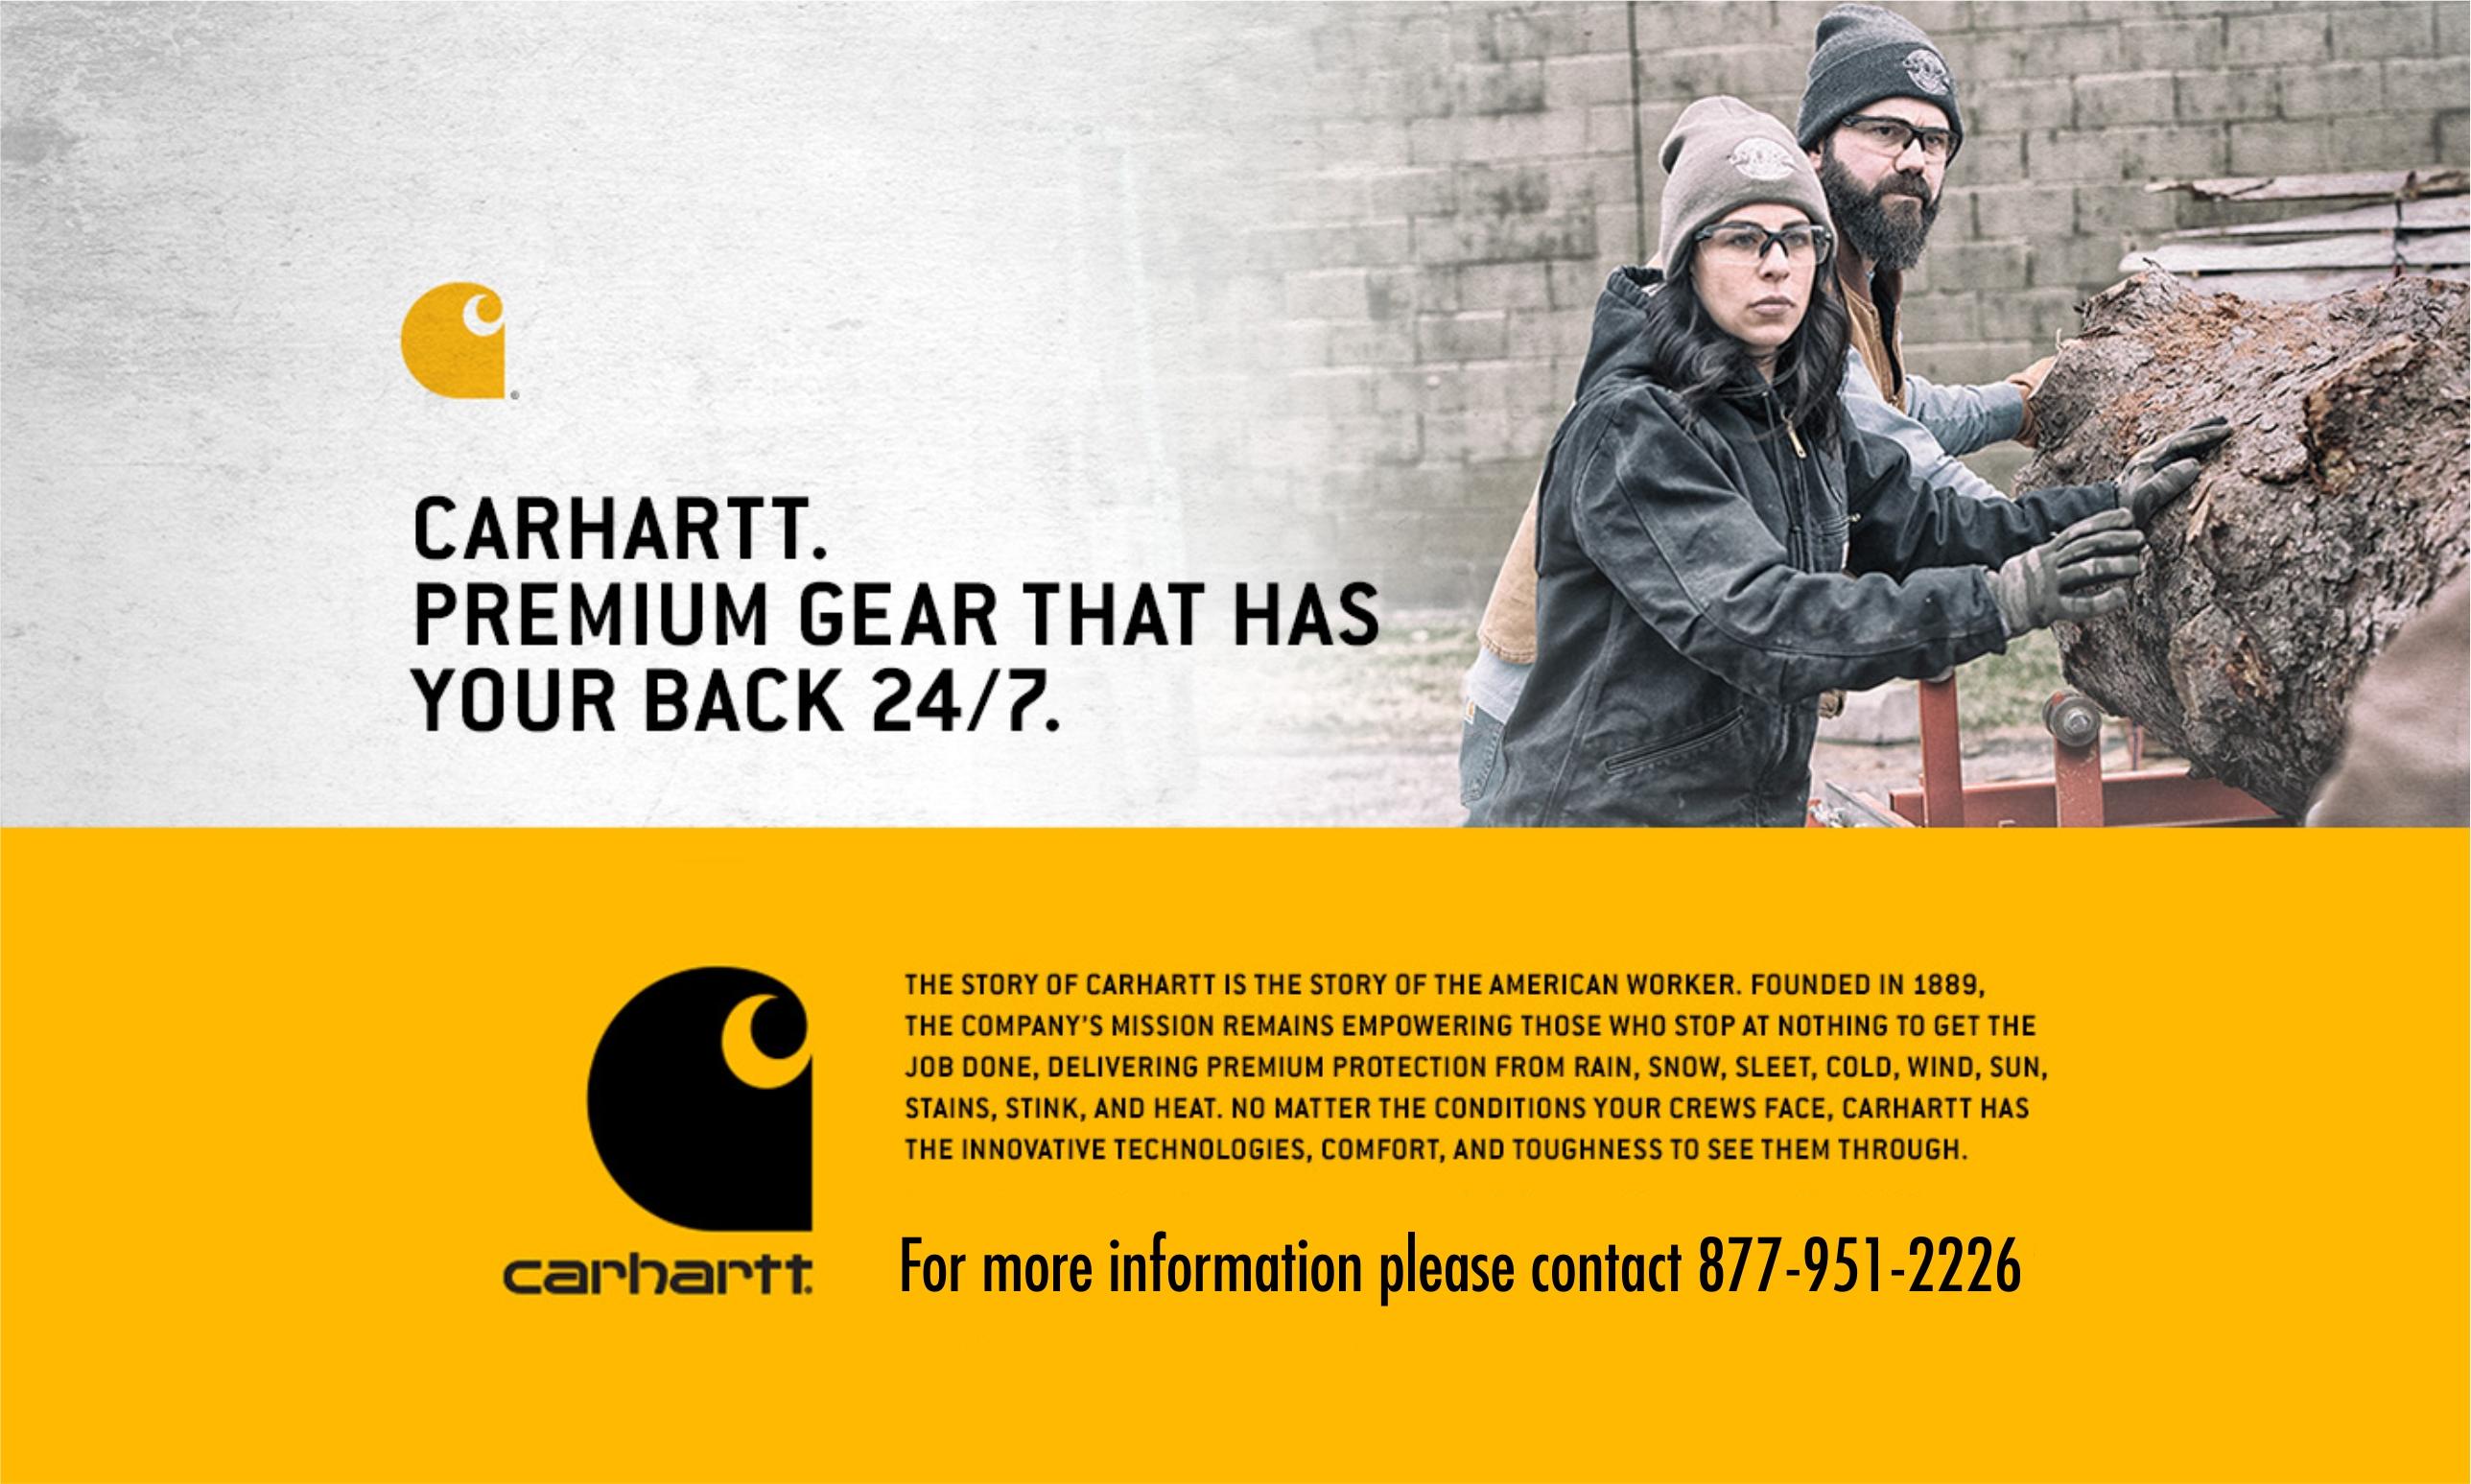 Carharttoption2141426.jpg